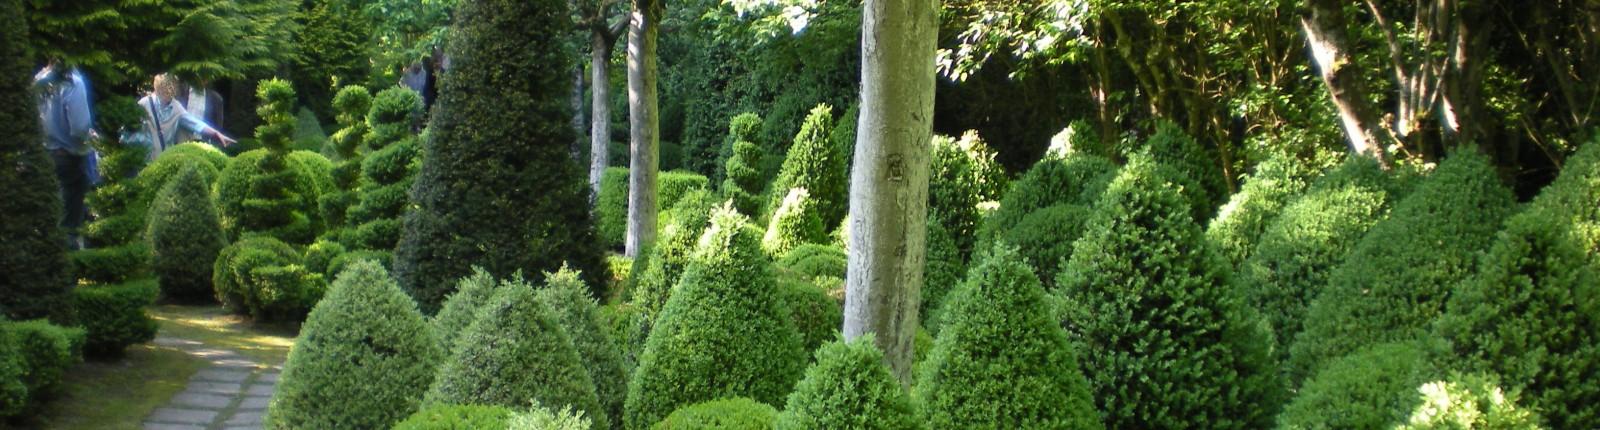 Jardins Séricourt 019 diapo